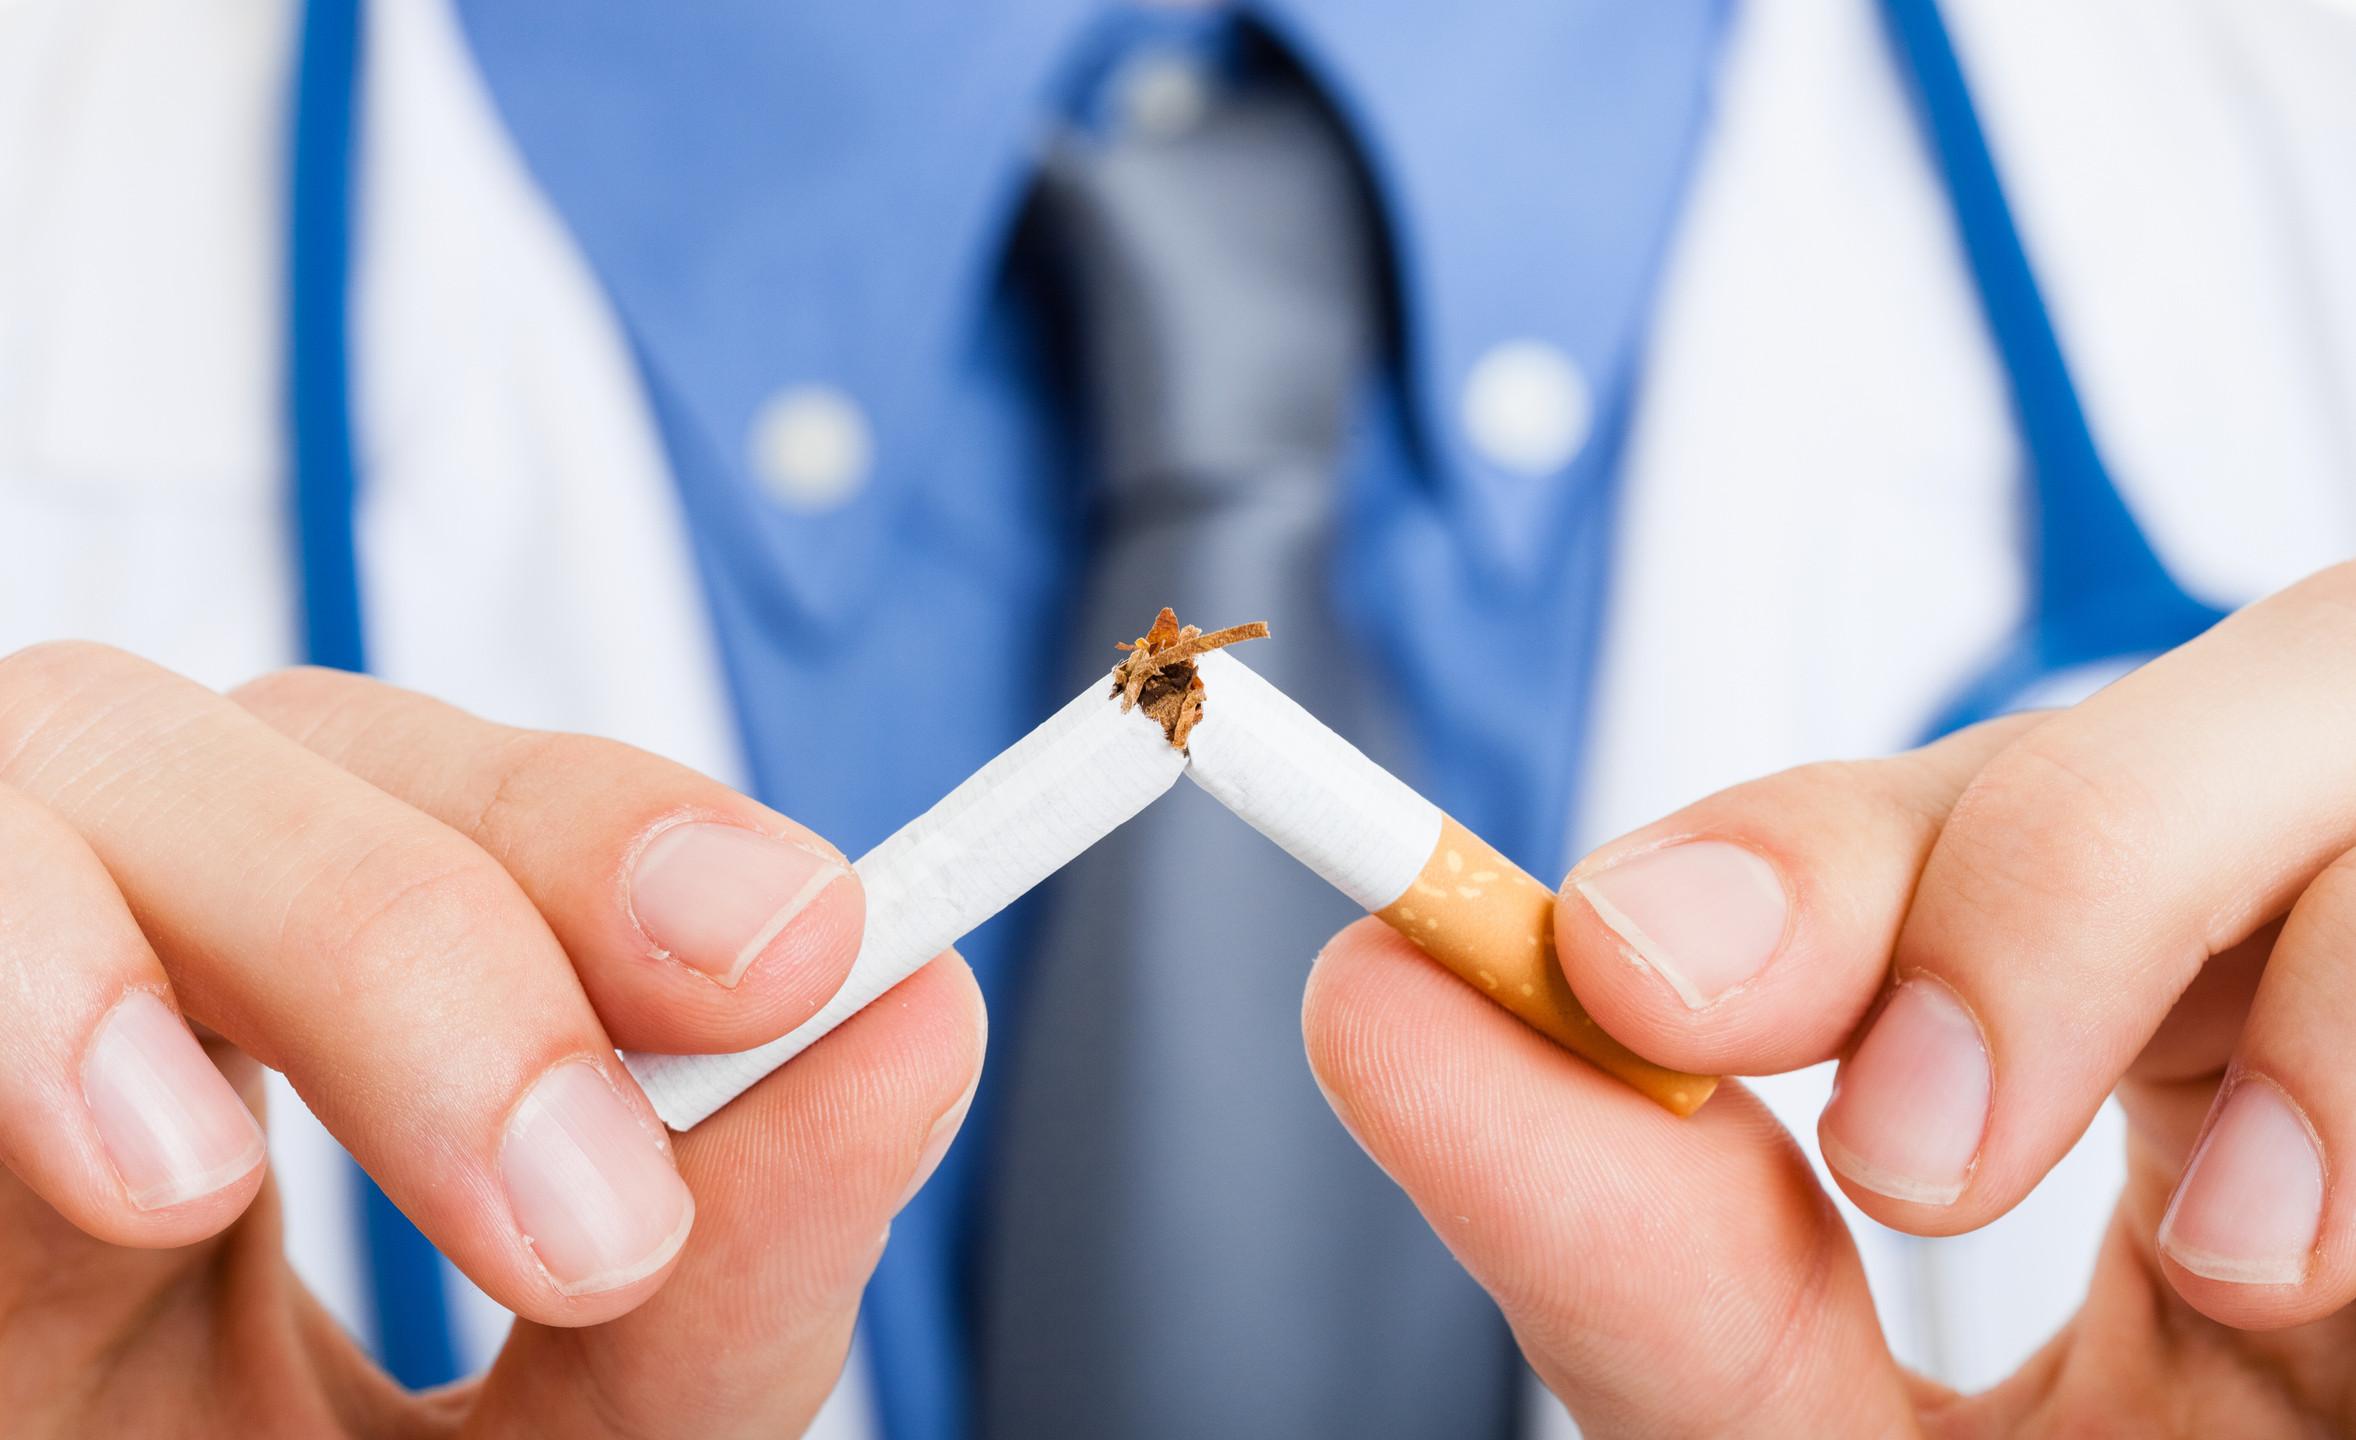 1. Fumo